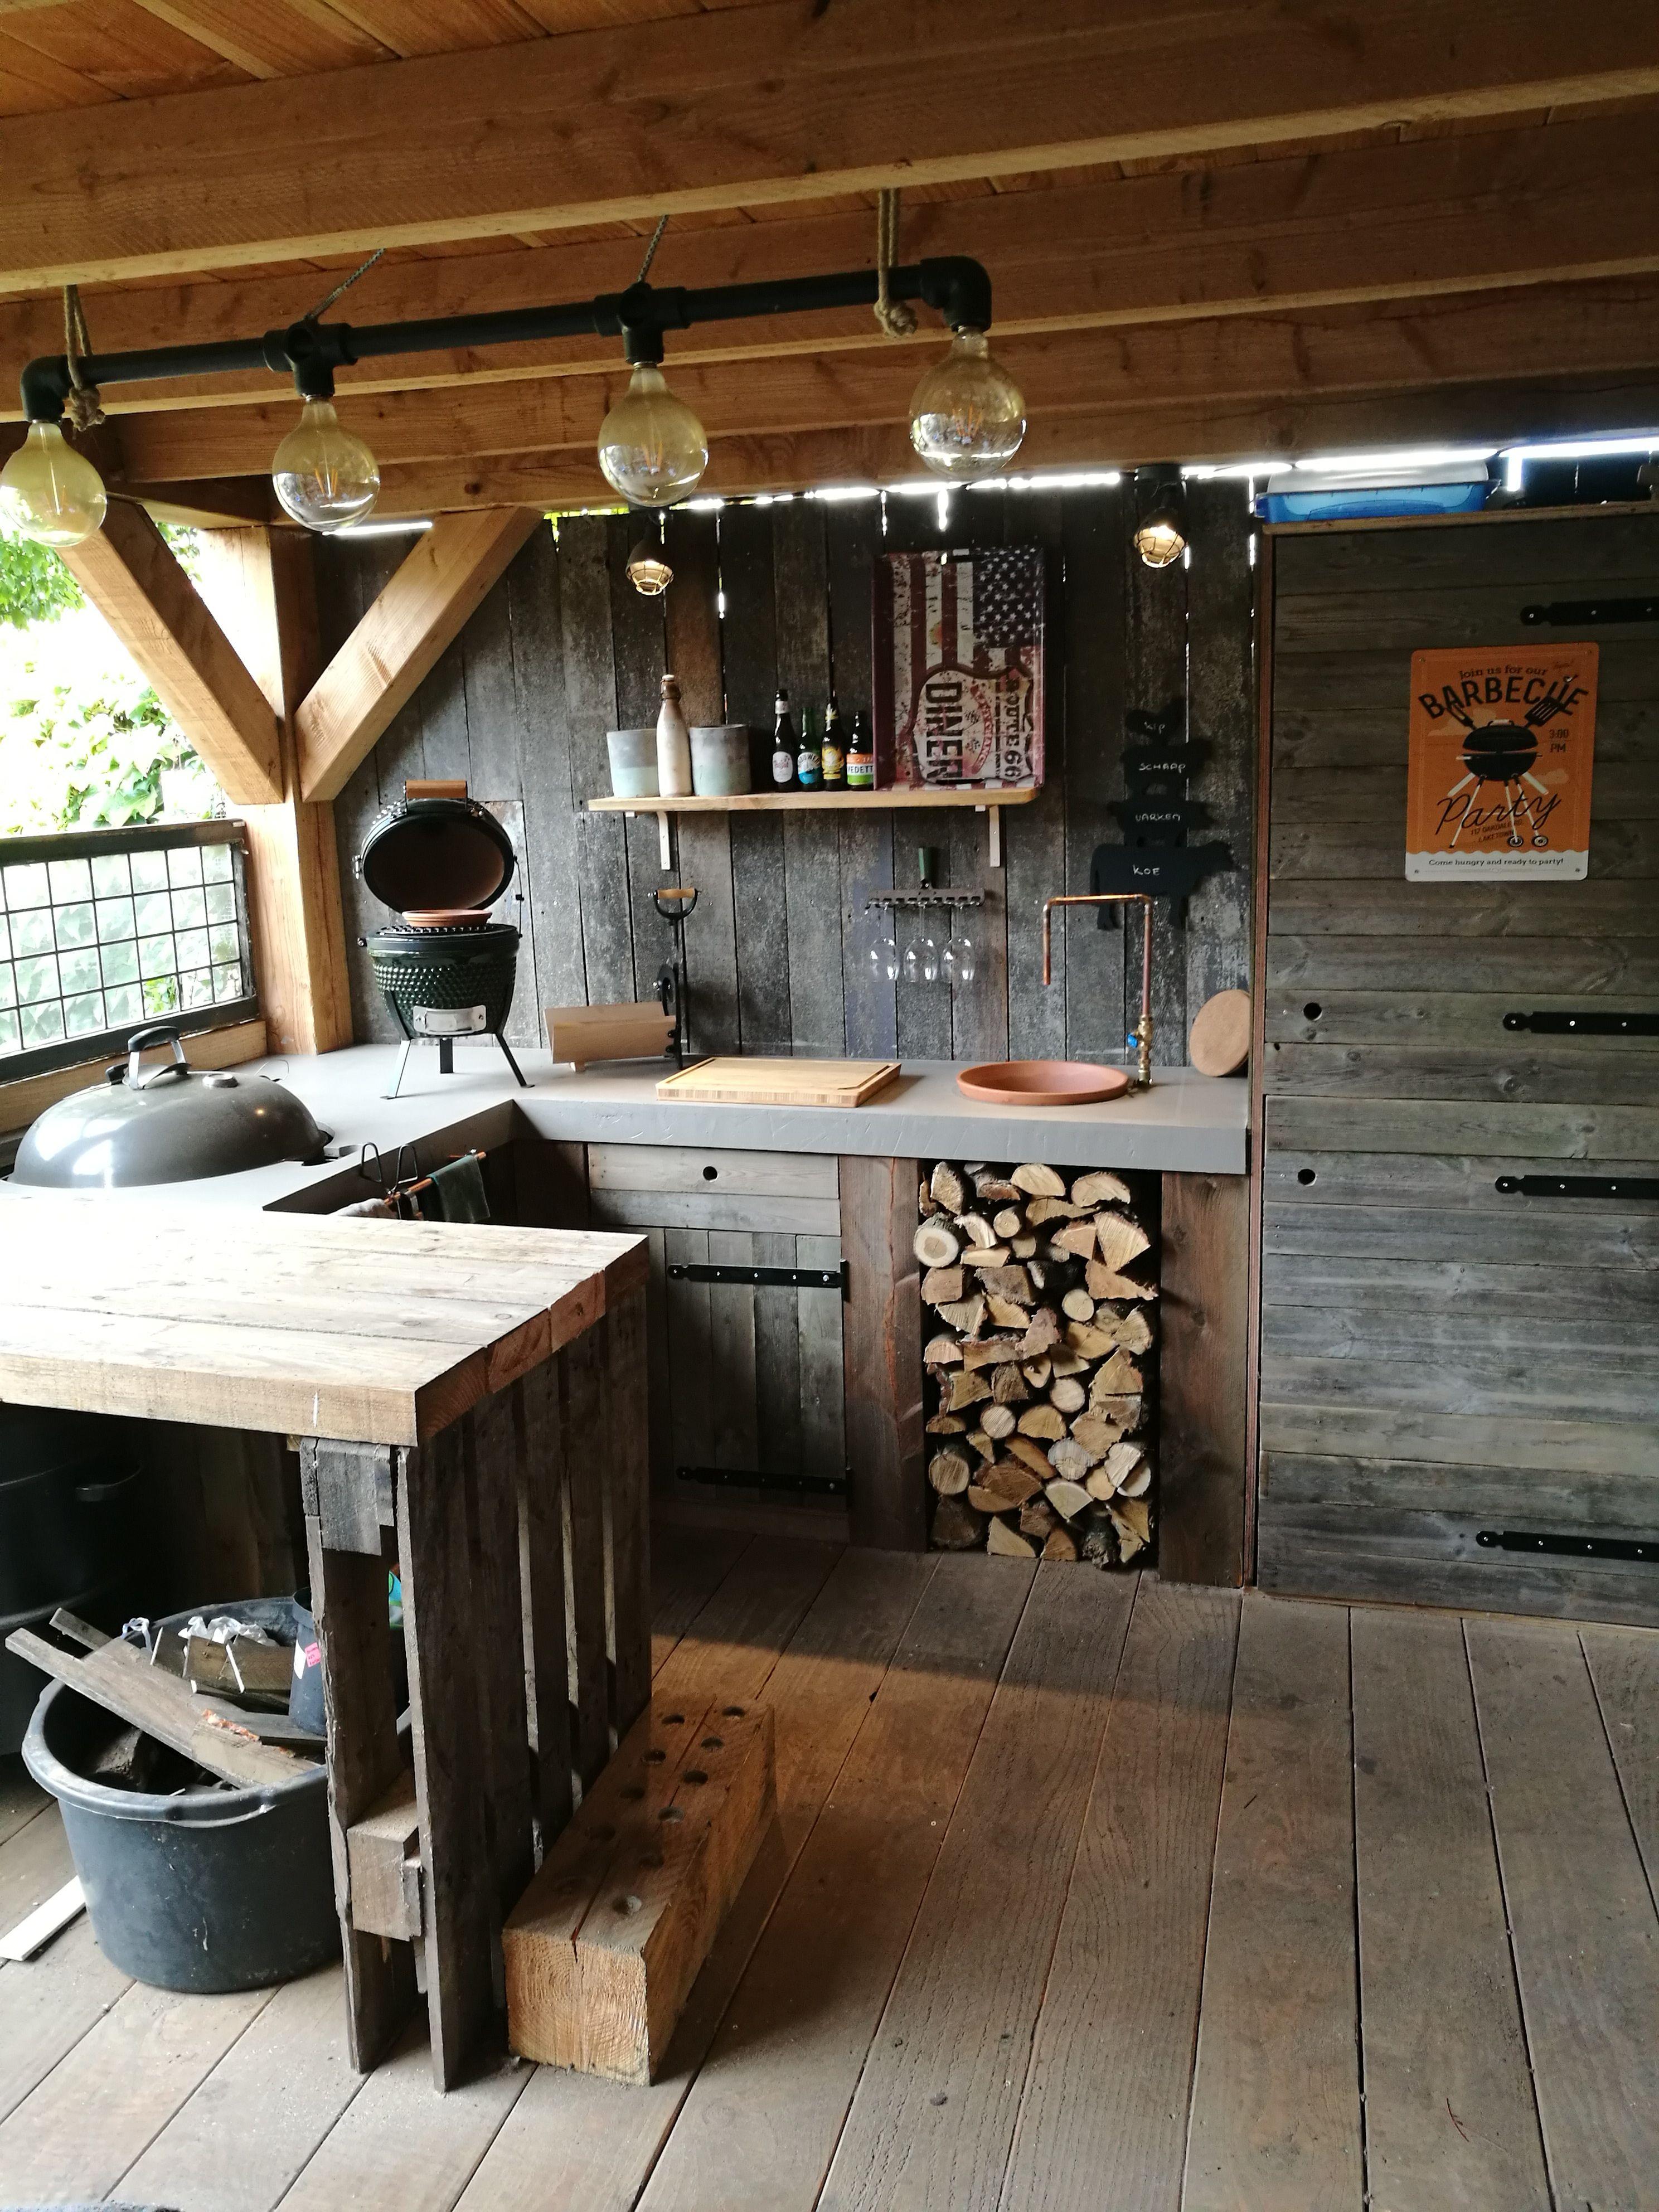 outdoor kitchen | outdoor kitchen in 2019 | Outdoor ...